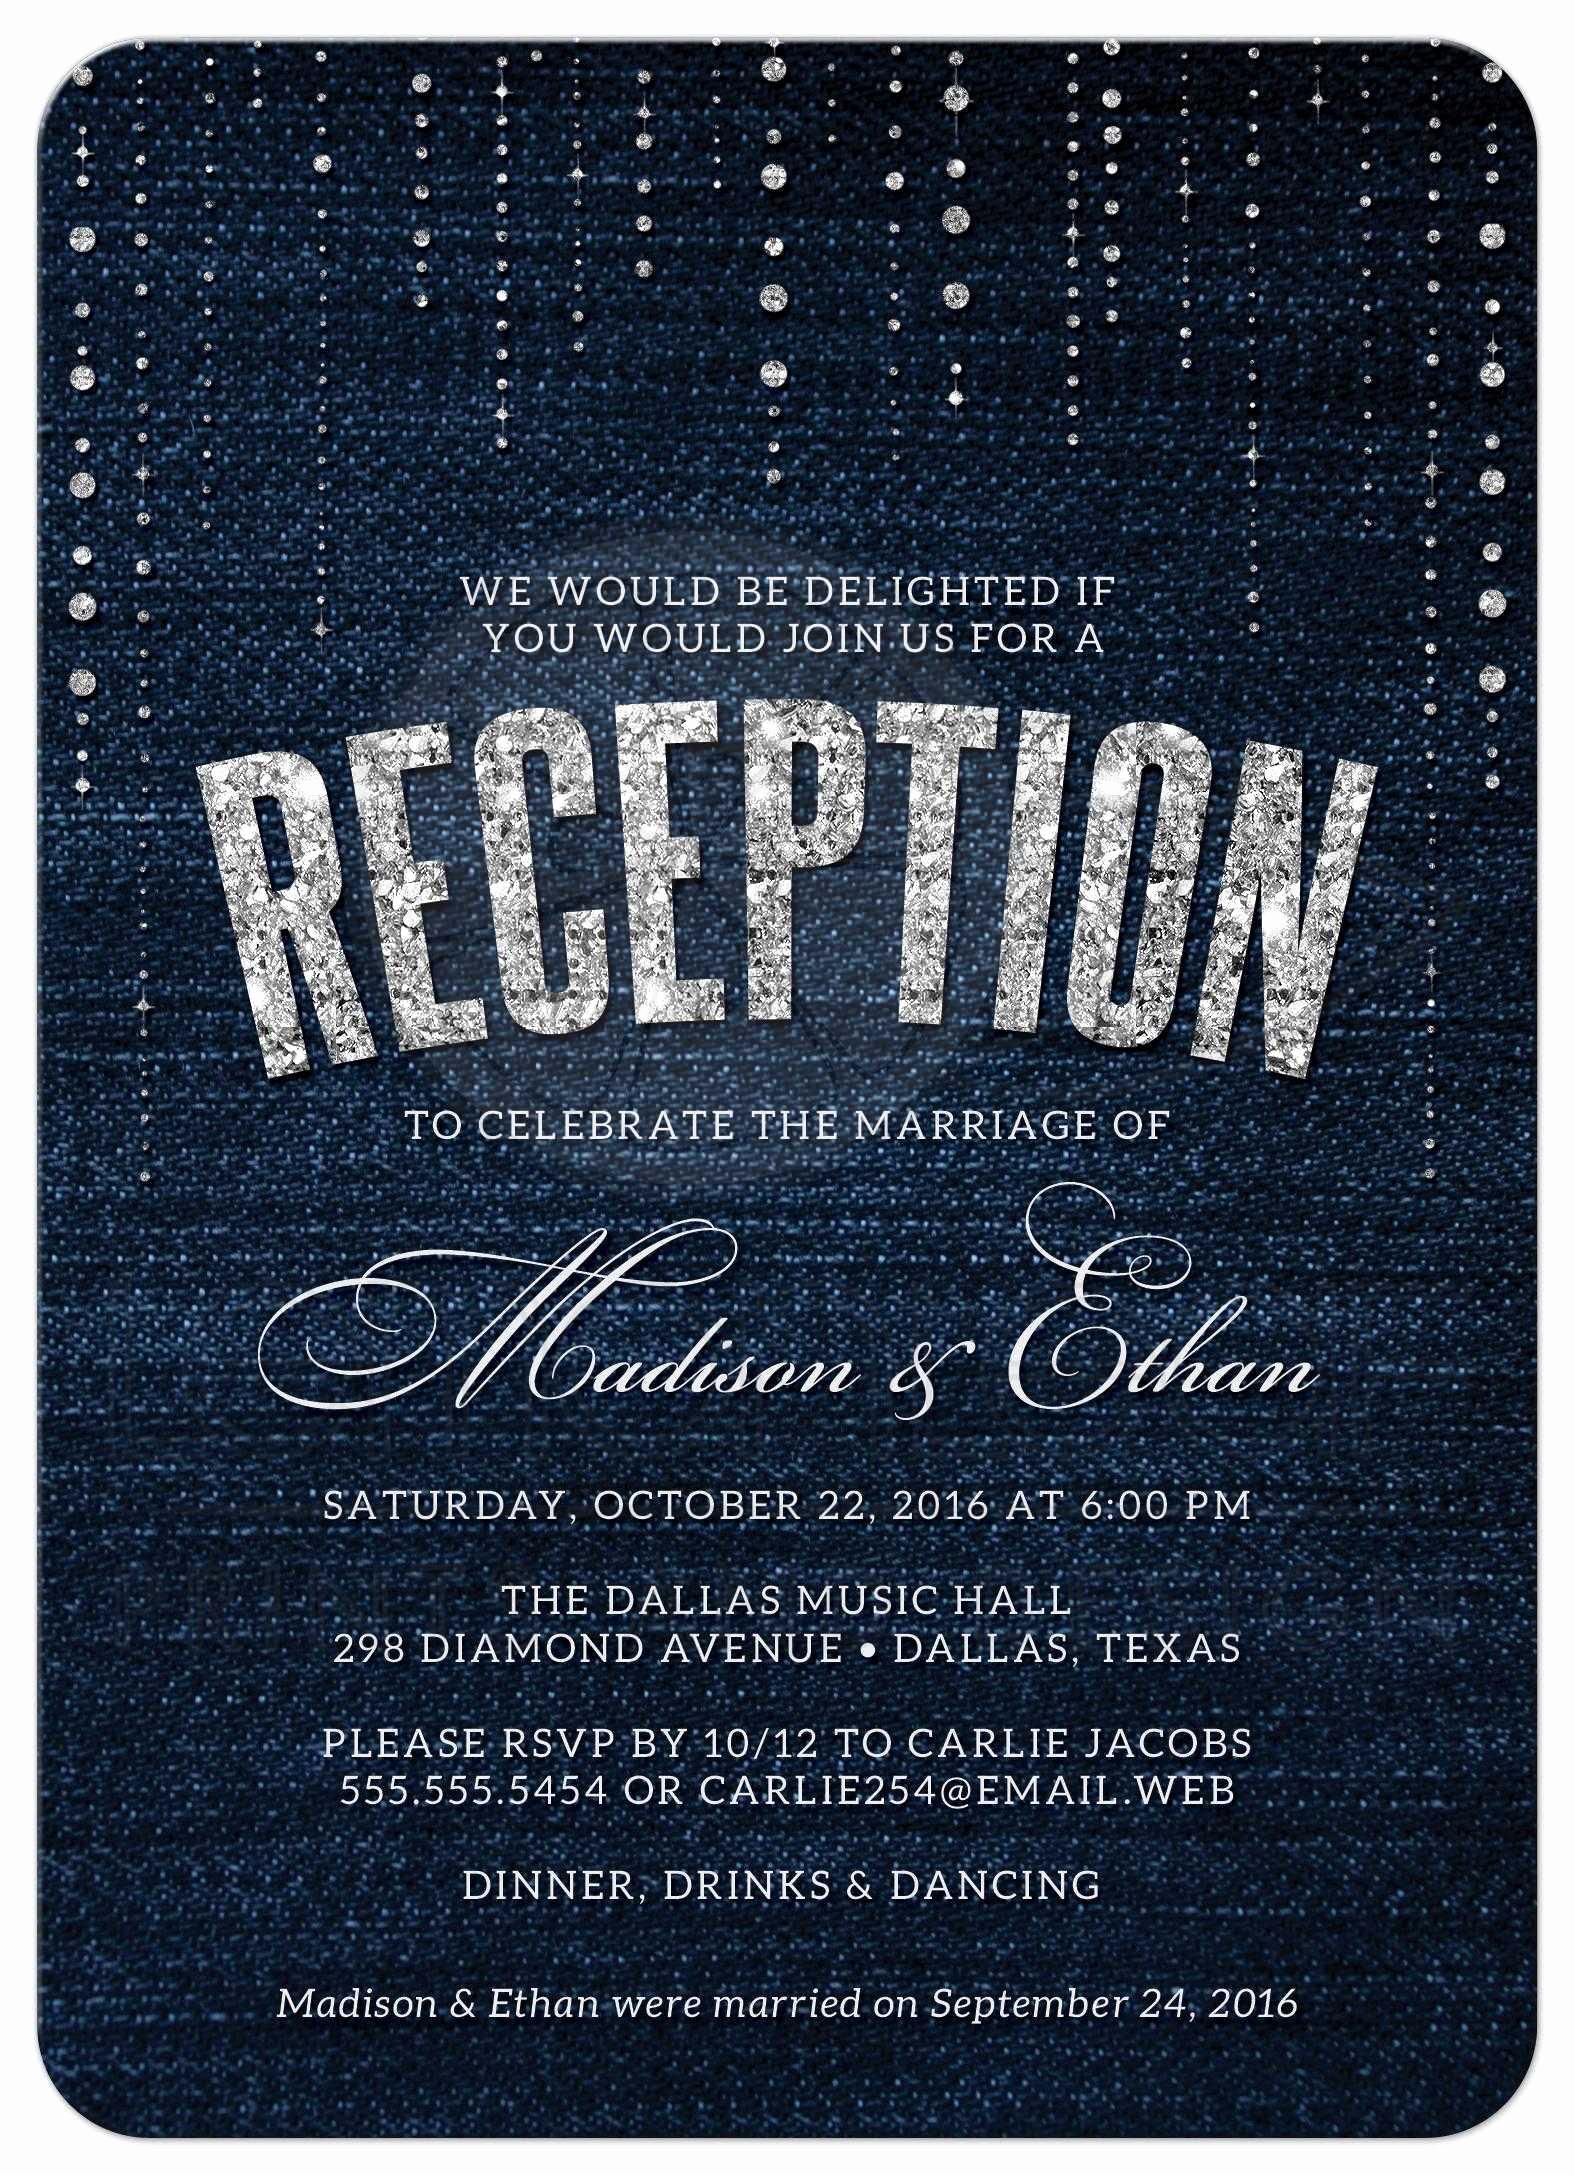 Wedding Reception Invitation Templates Inspirational Post Wedding Reception Ly Invitations Denim & Diamonds